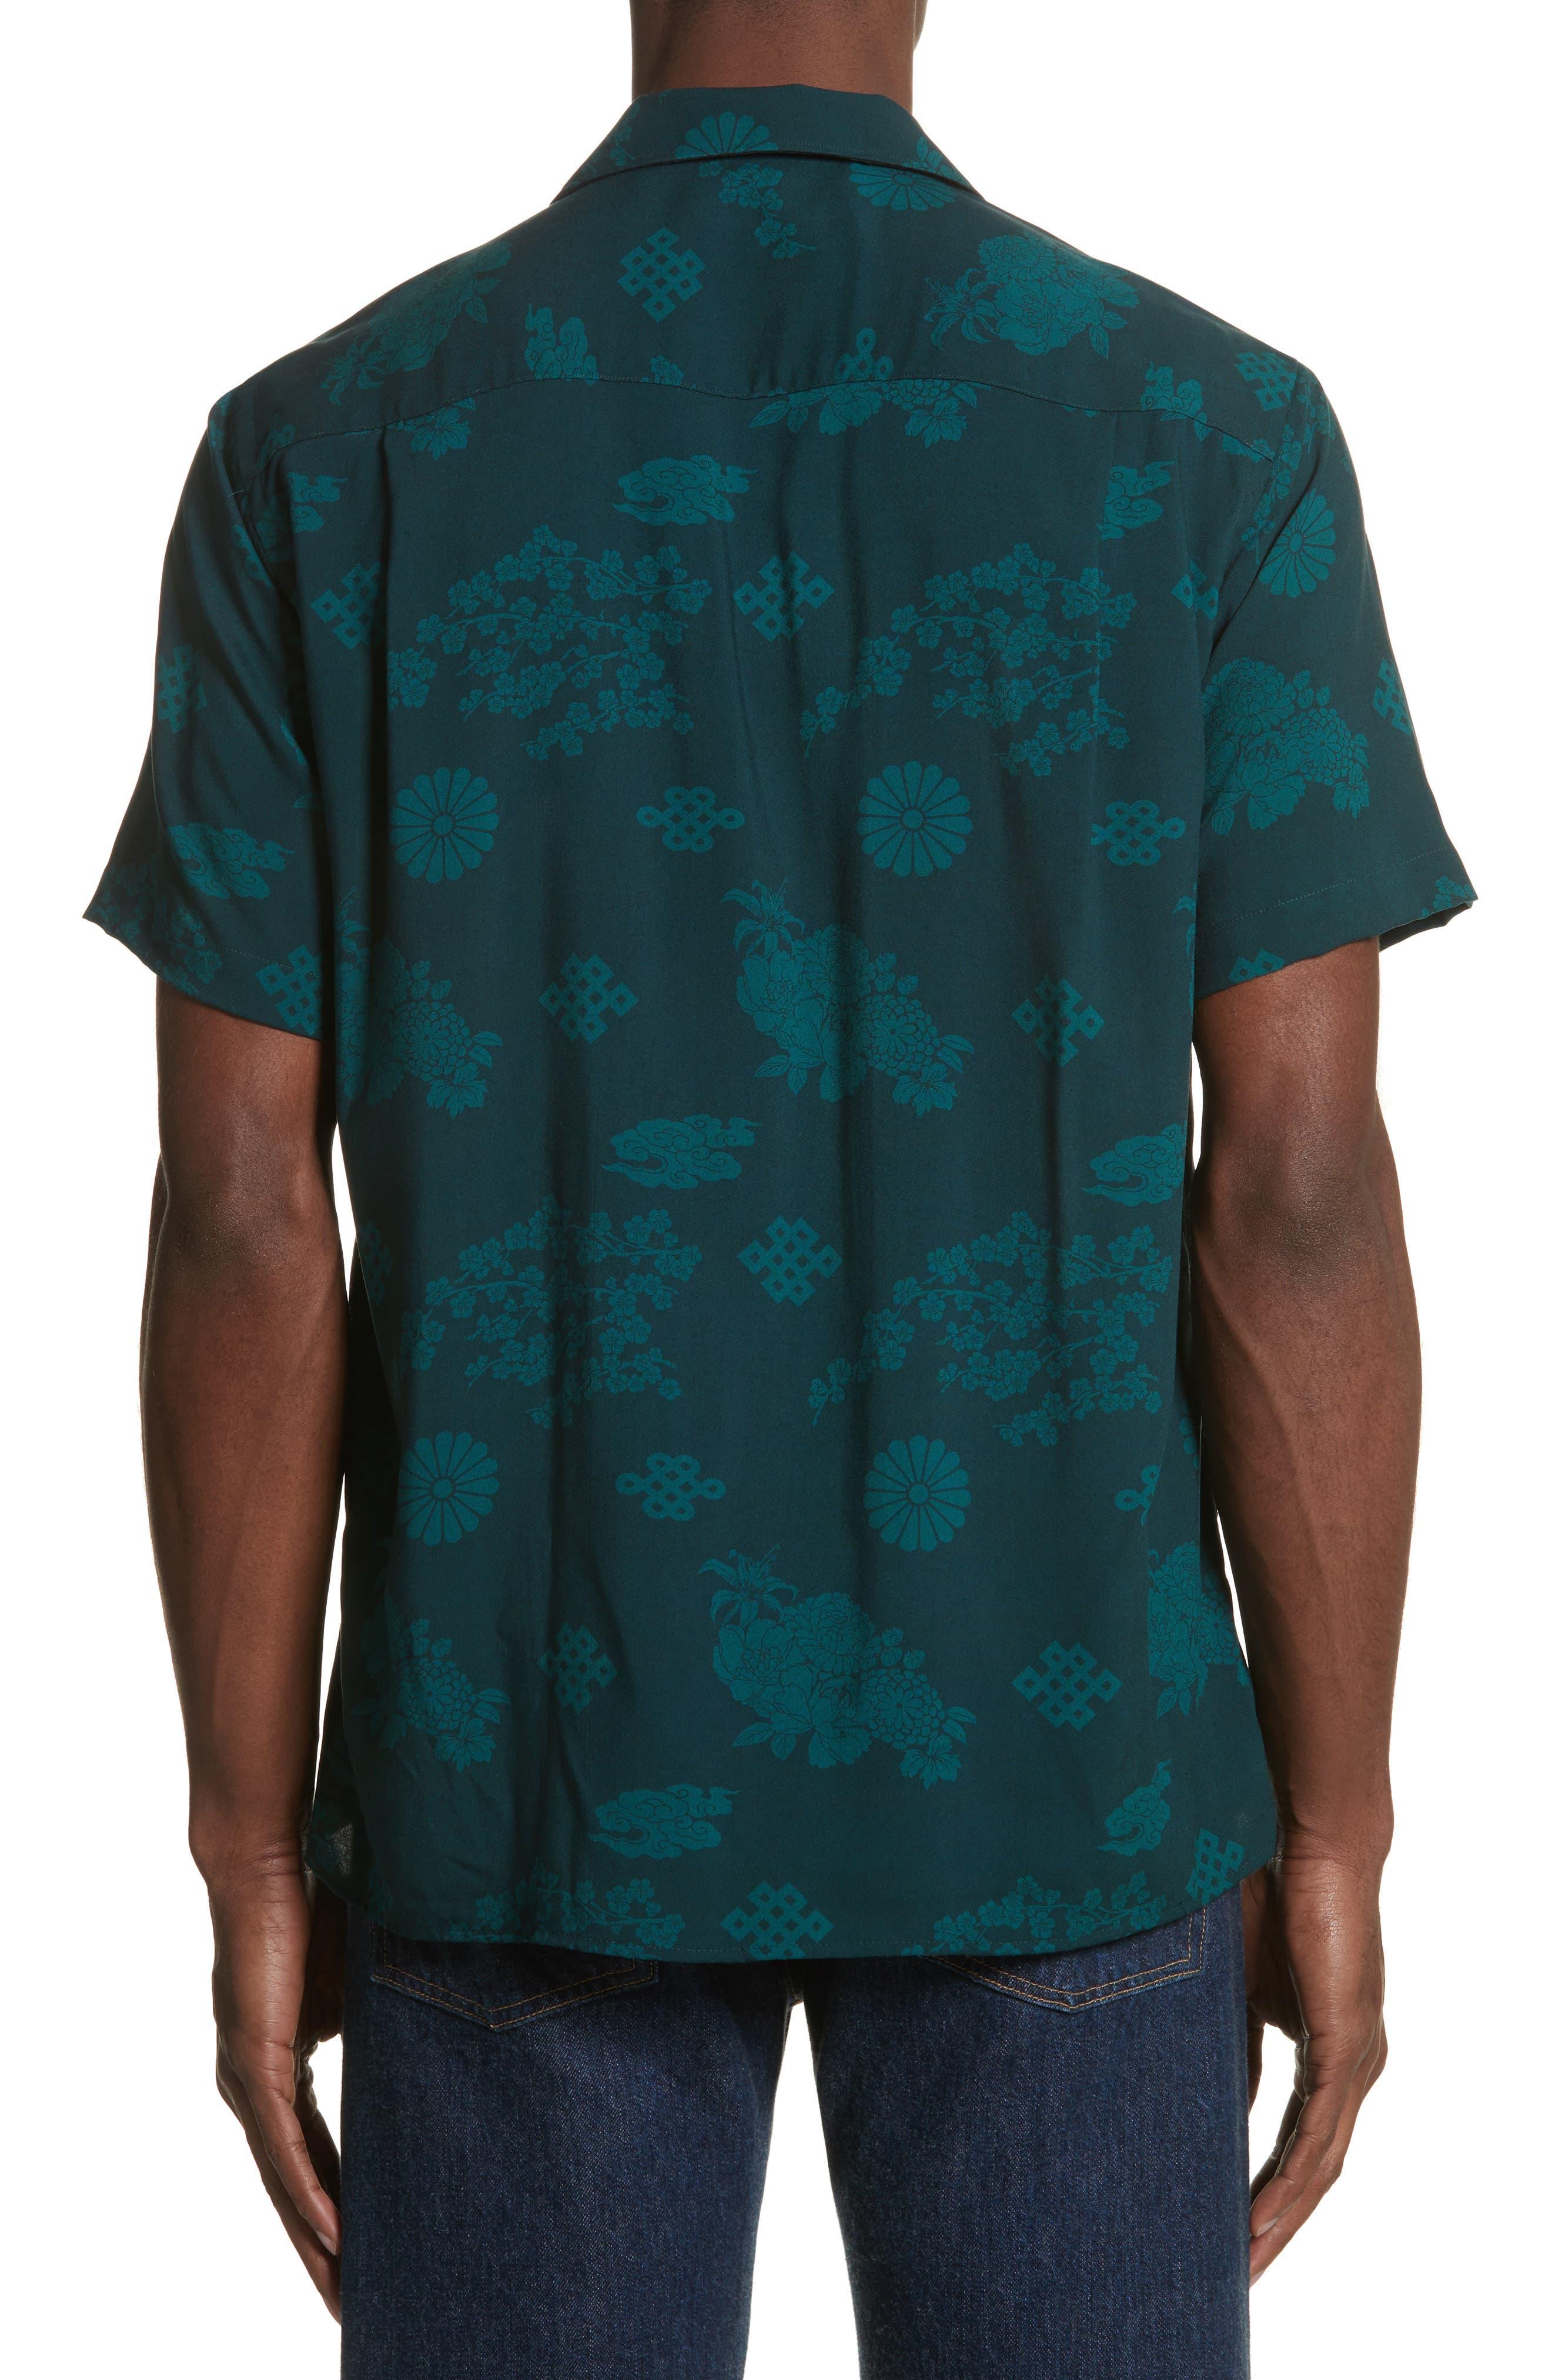 x The North Face Men's Floral Print Camp Shirt,                             Alternate thumbnail 3, color,                             300